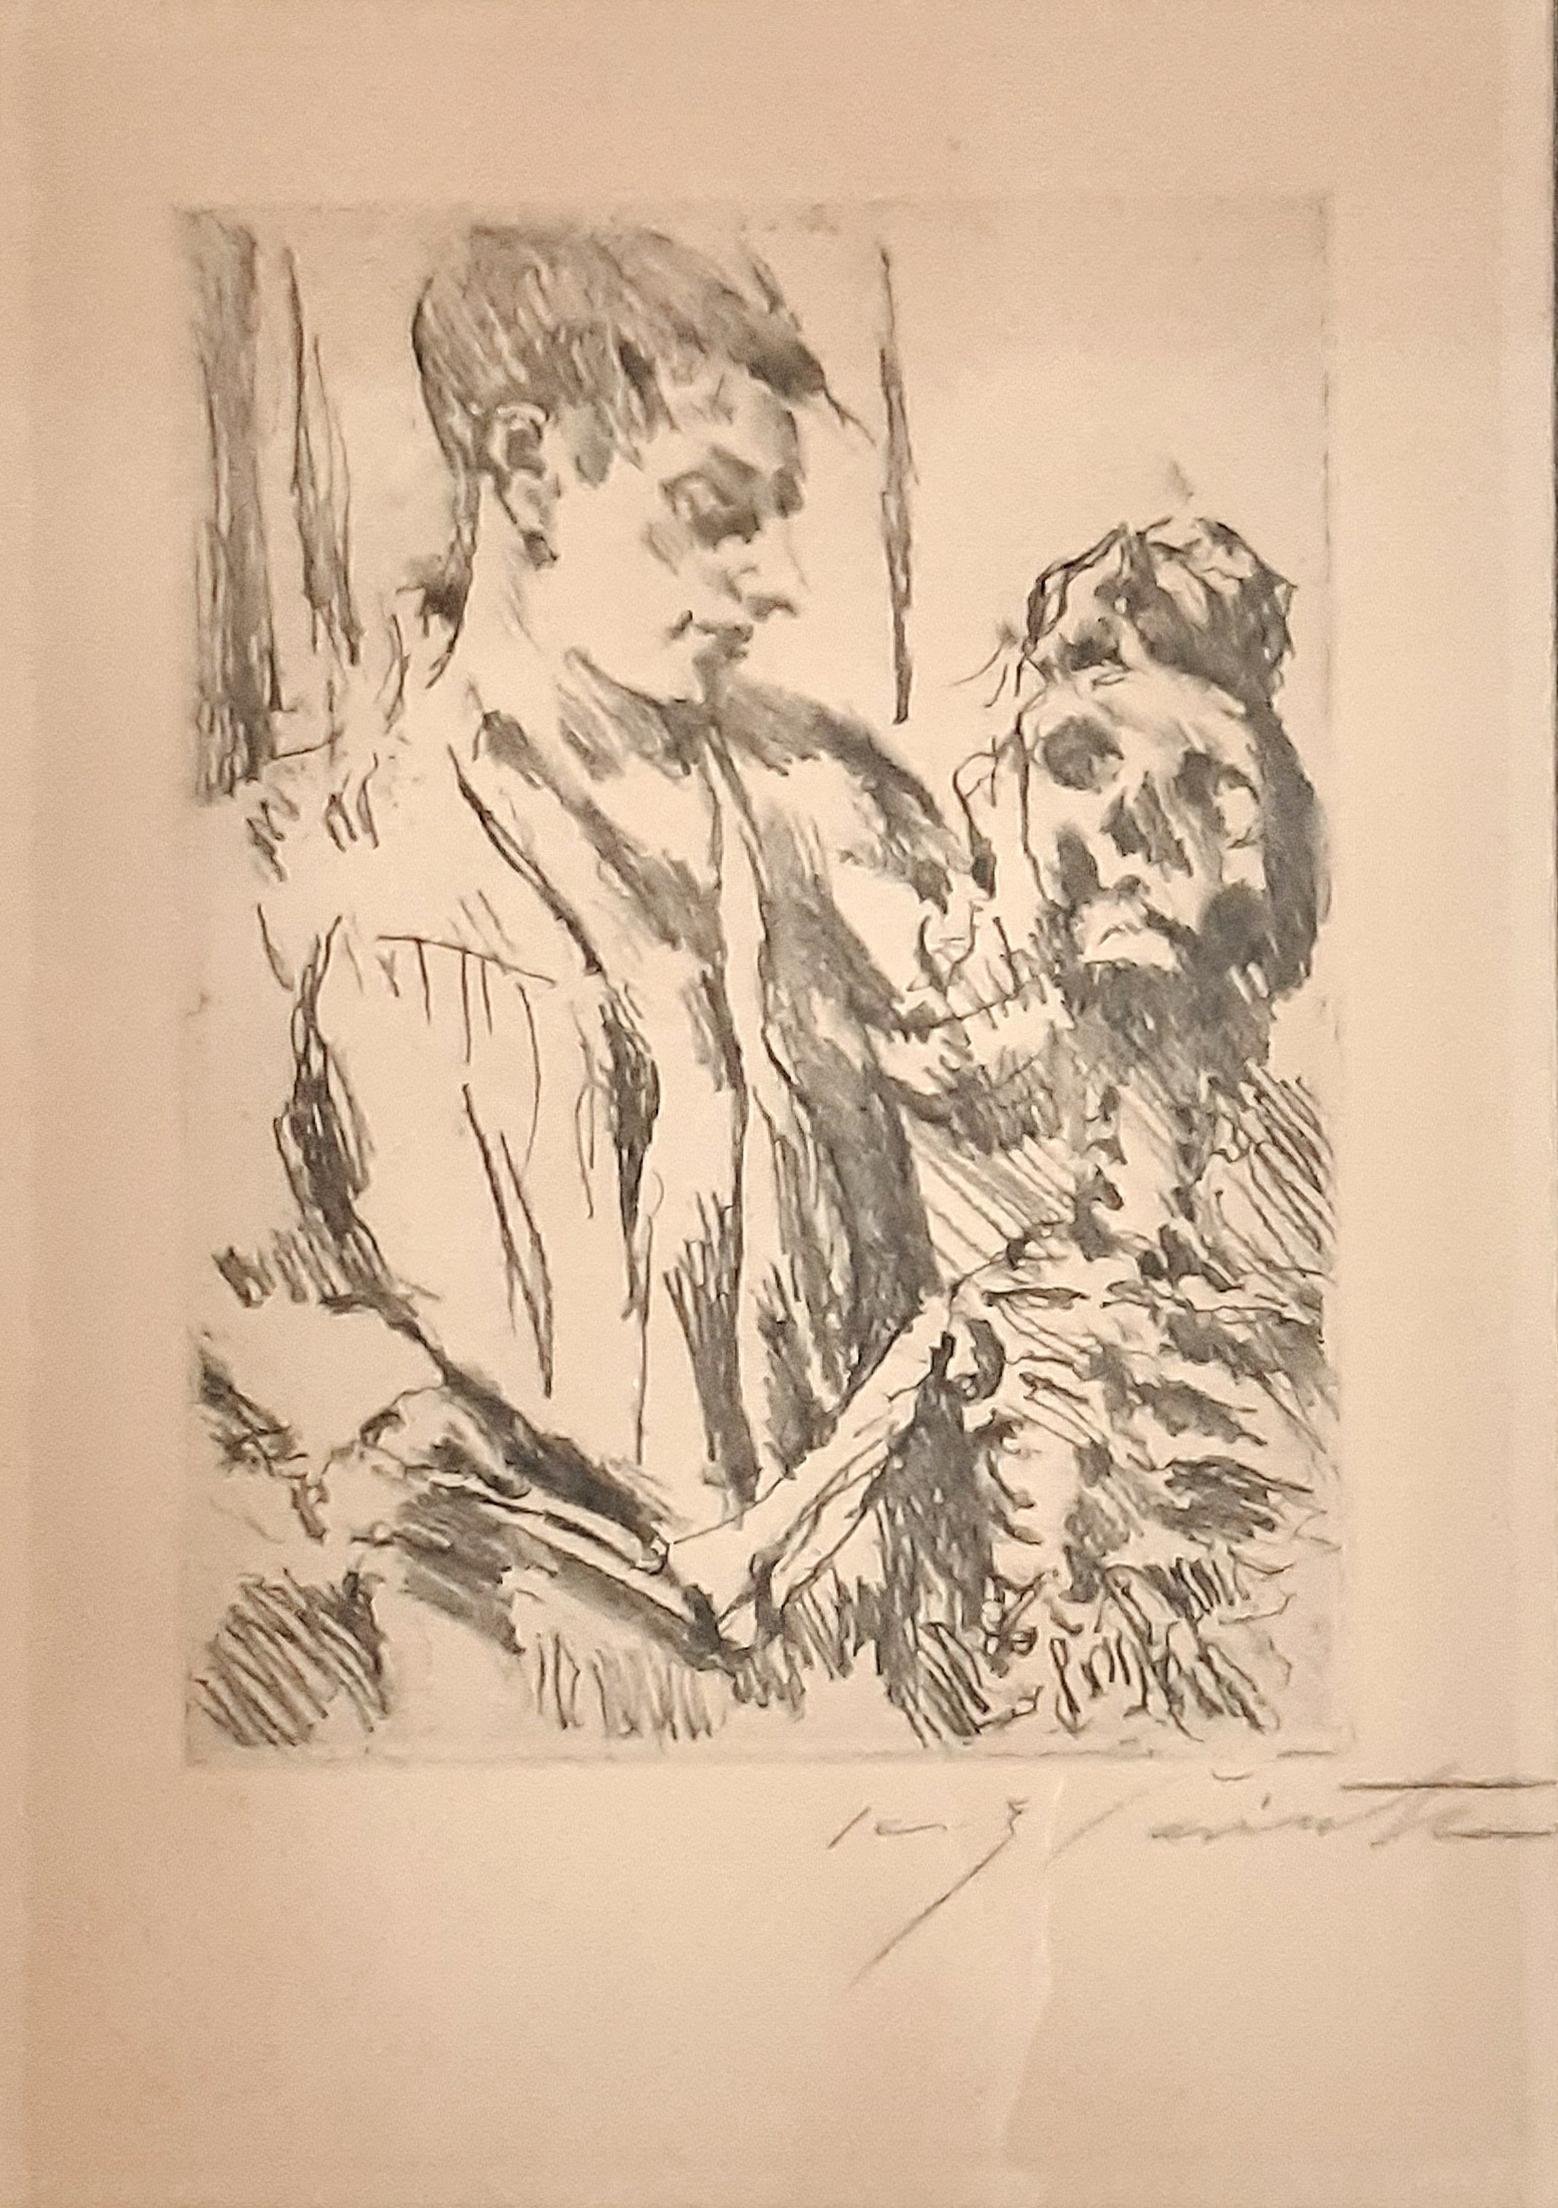 Tod und Jungling - Original Lithograph by L. Corinth - 1921